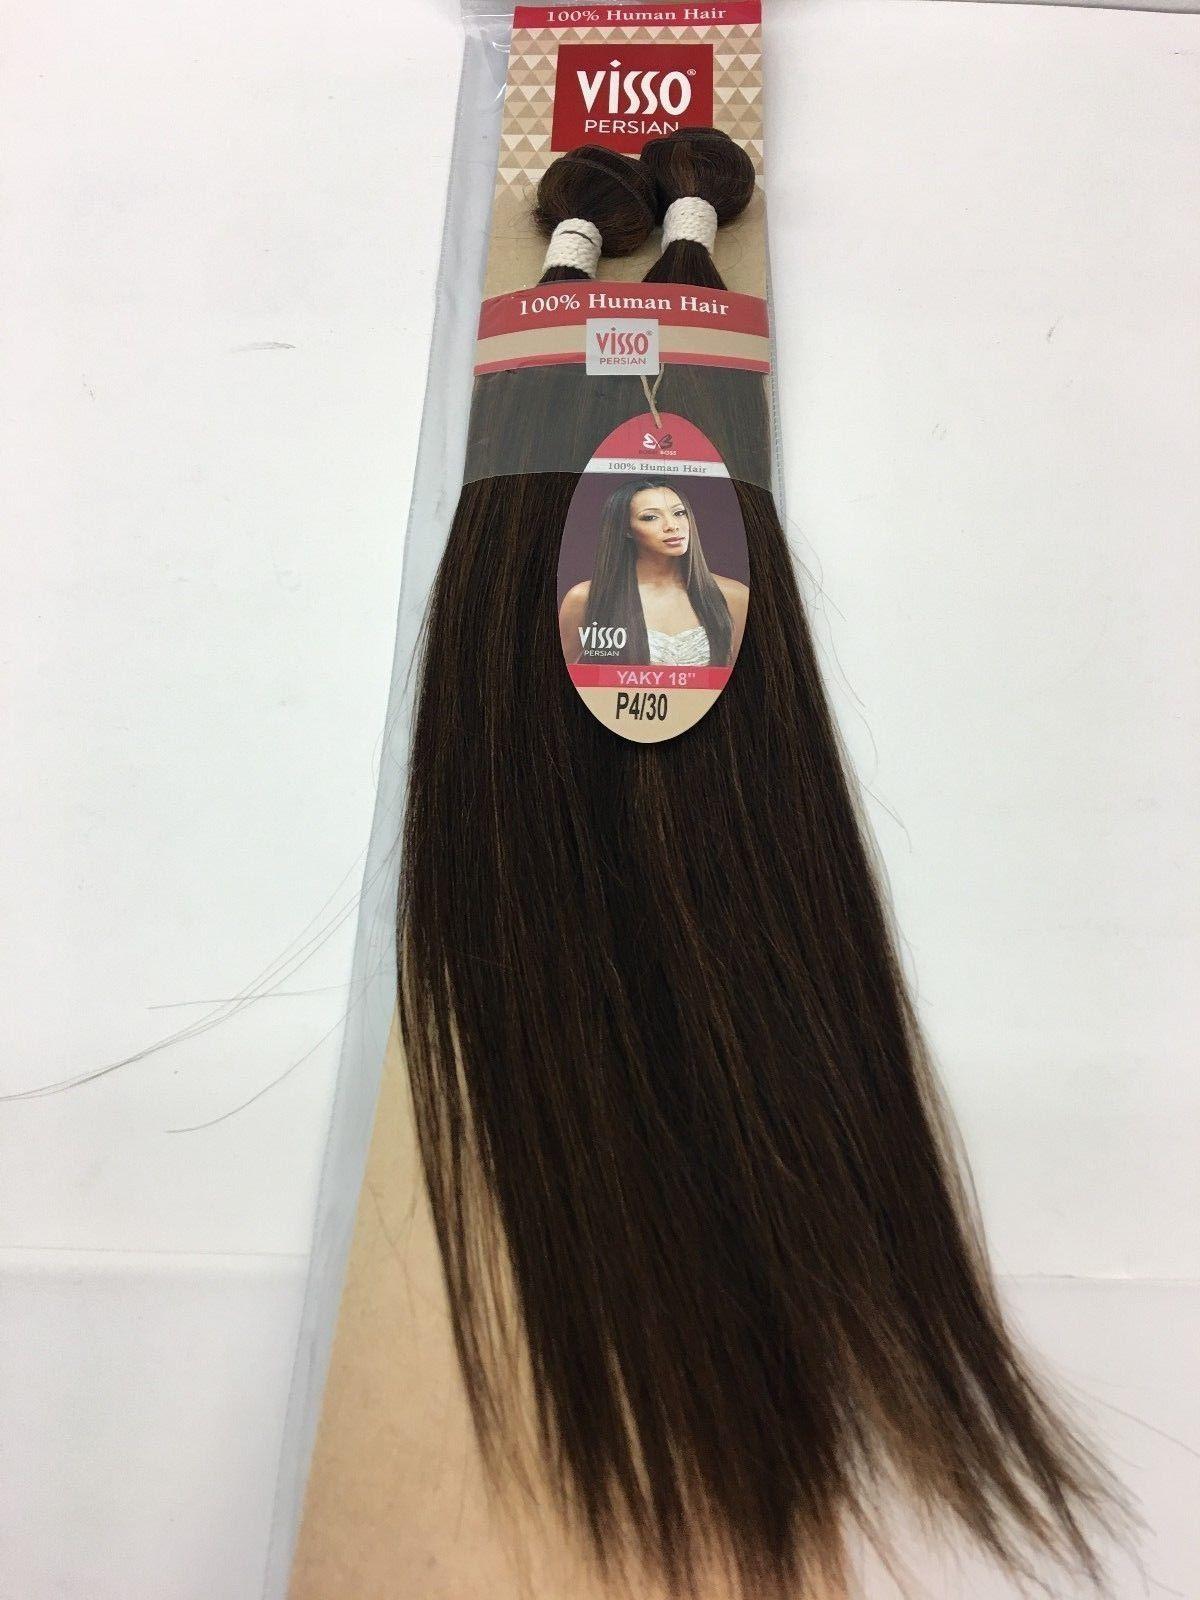 Bobbi Boss Visso Persian Yaky 100 Human Weave Hair Extensions 18